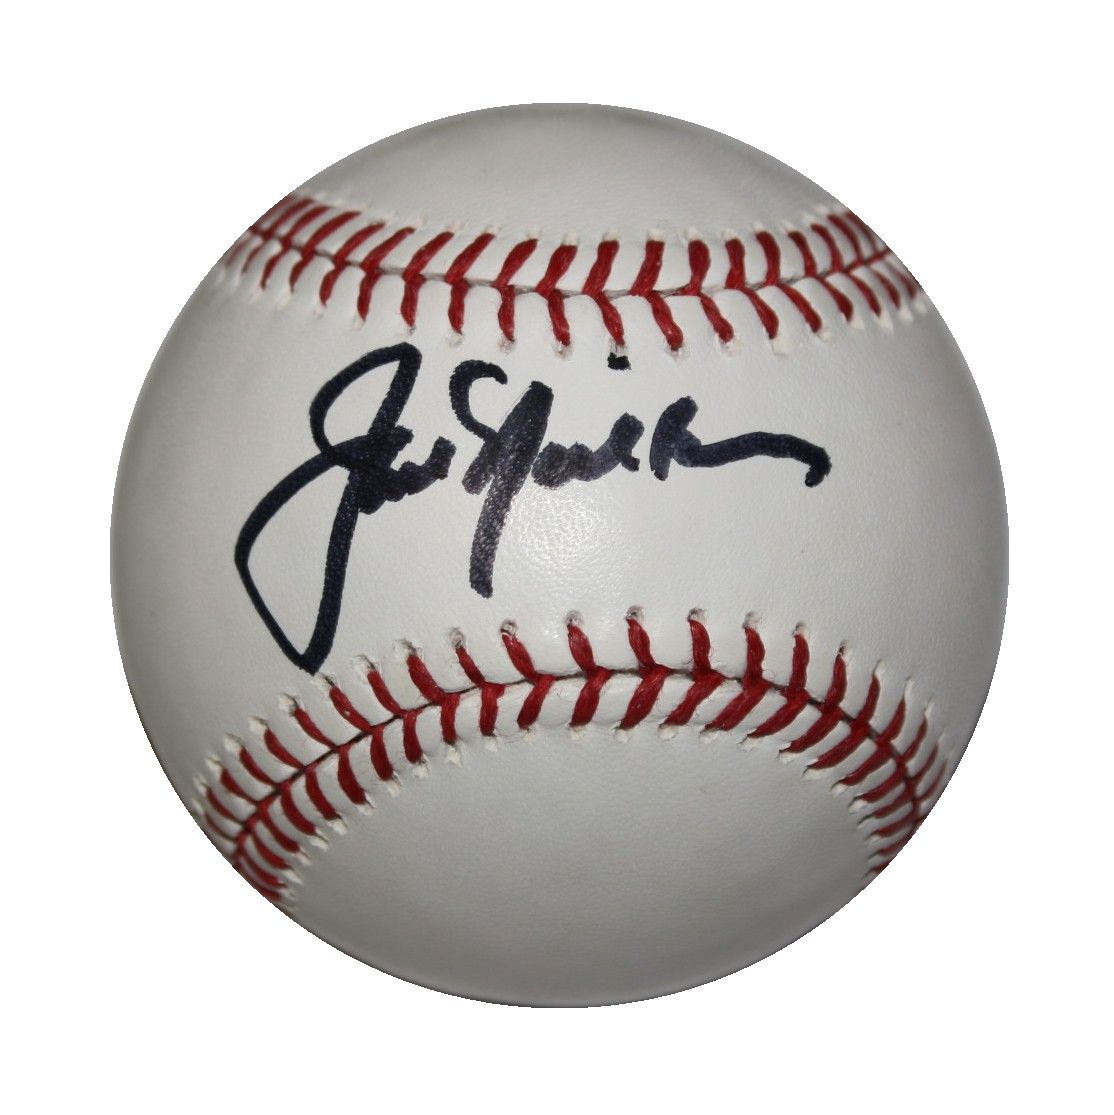 755aaedb601 Jack Nicklaus Signed Rawlings Baseball JSA Full Letter Cert #Y00131 ...